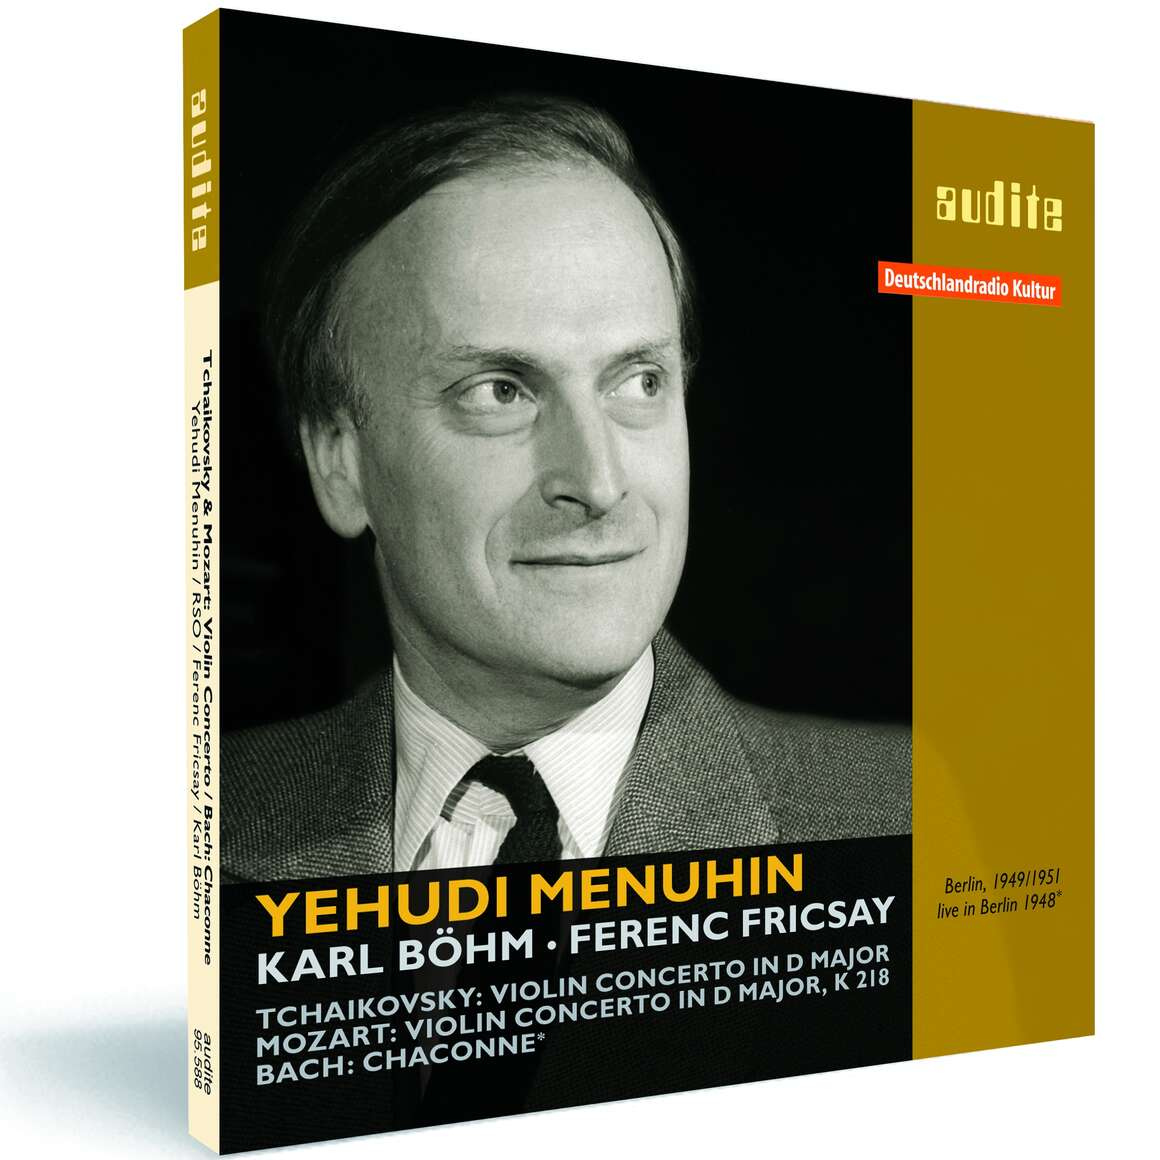 Yehudi Menuhin plays Tchaikovsky: Violin Concerto, Mozart: Violin Concerto K 218 & Bach: Chaconne from Partita No. 2